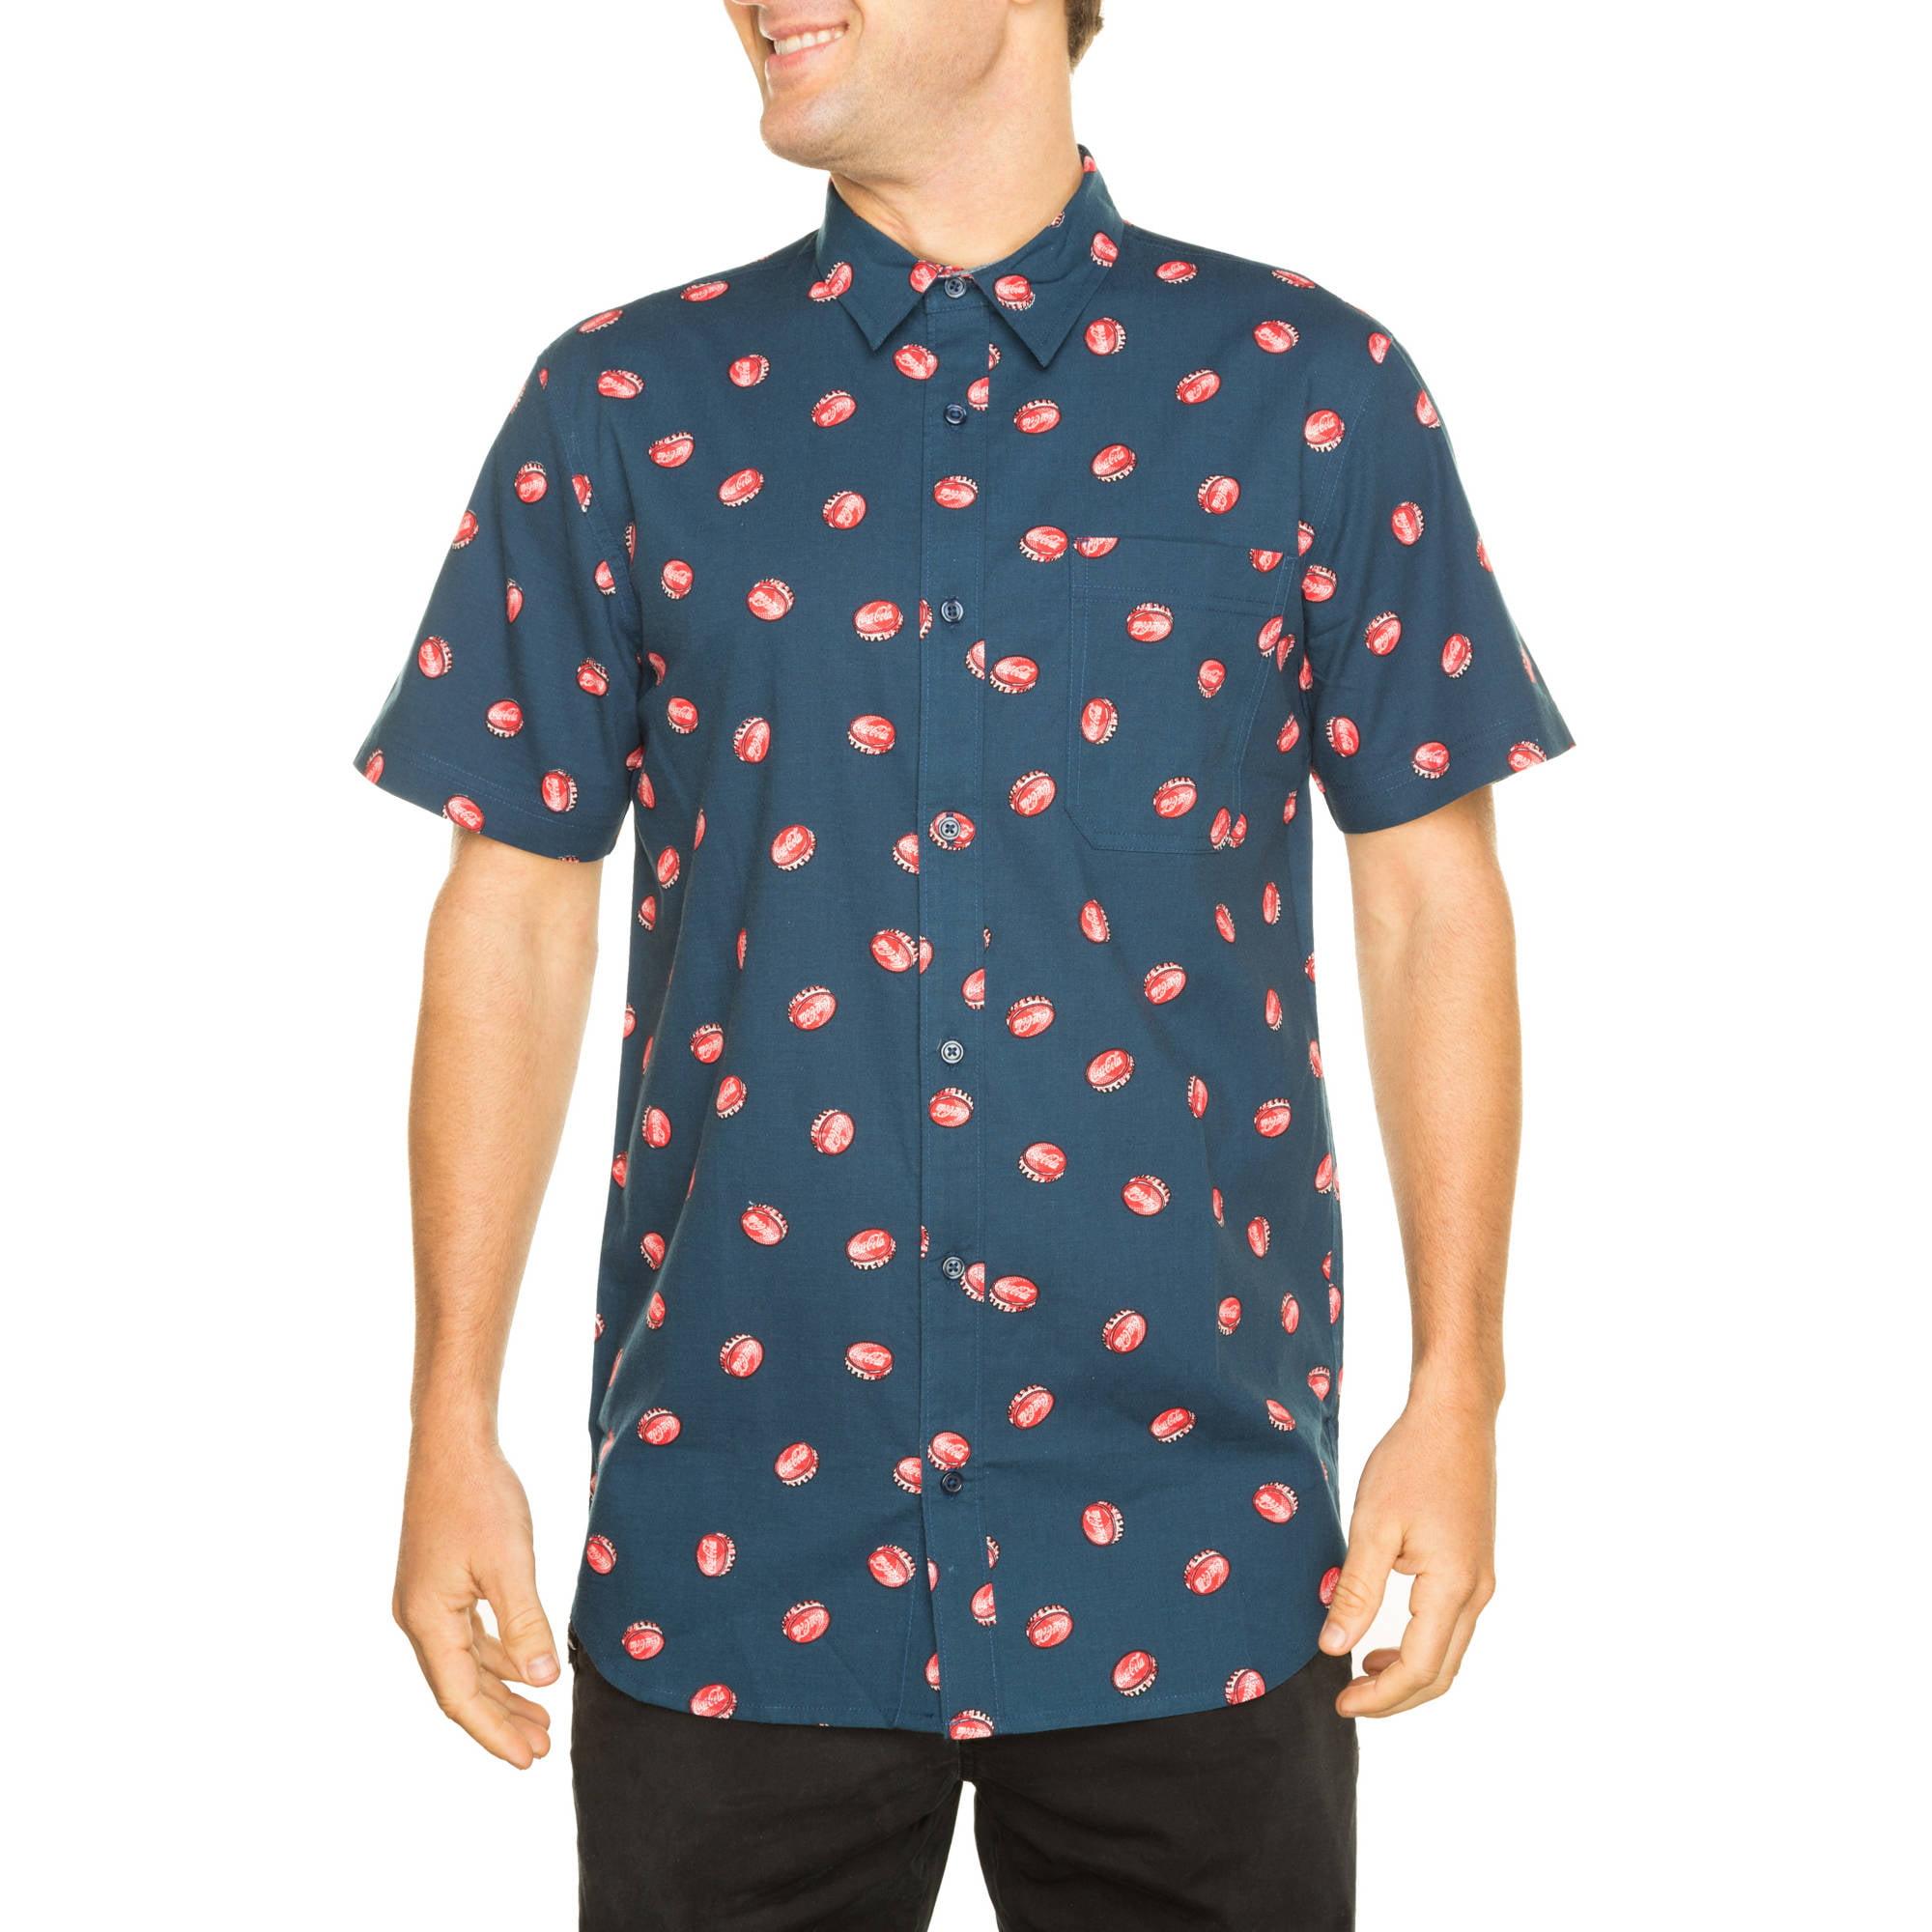 Coca Cola All Over Printed Men's Short Sleeve Woven Shirt